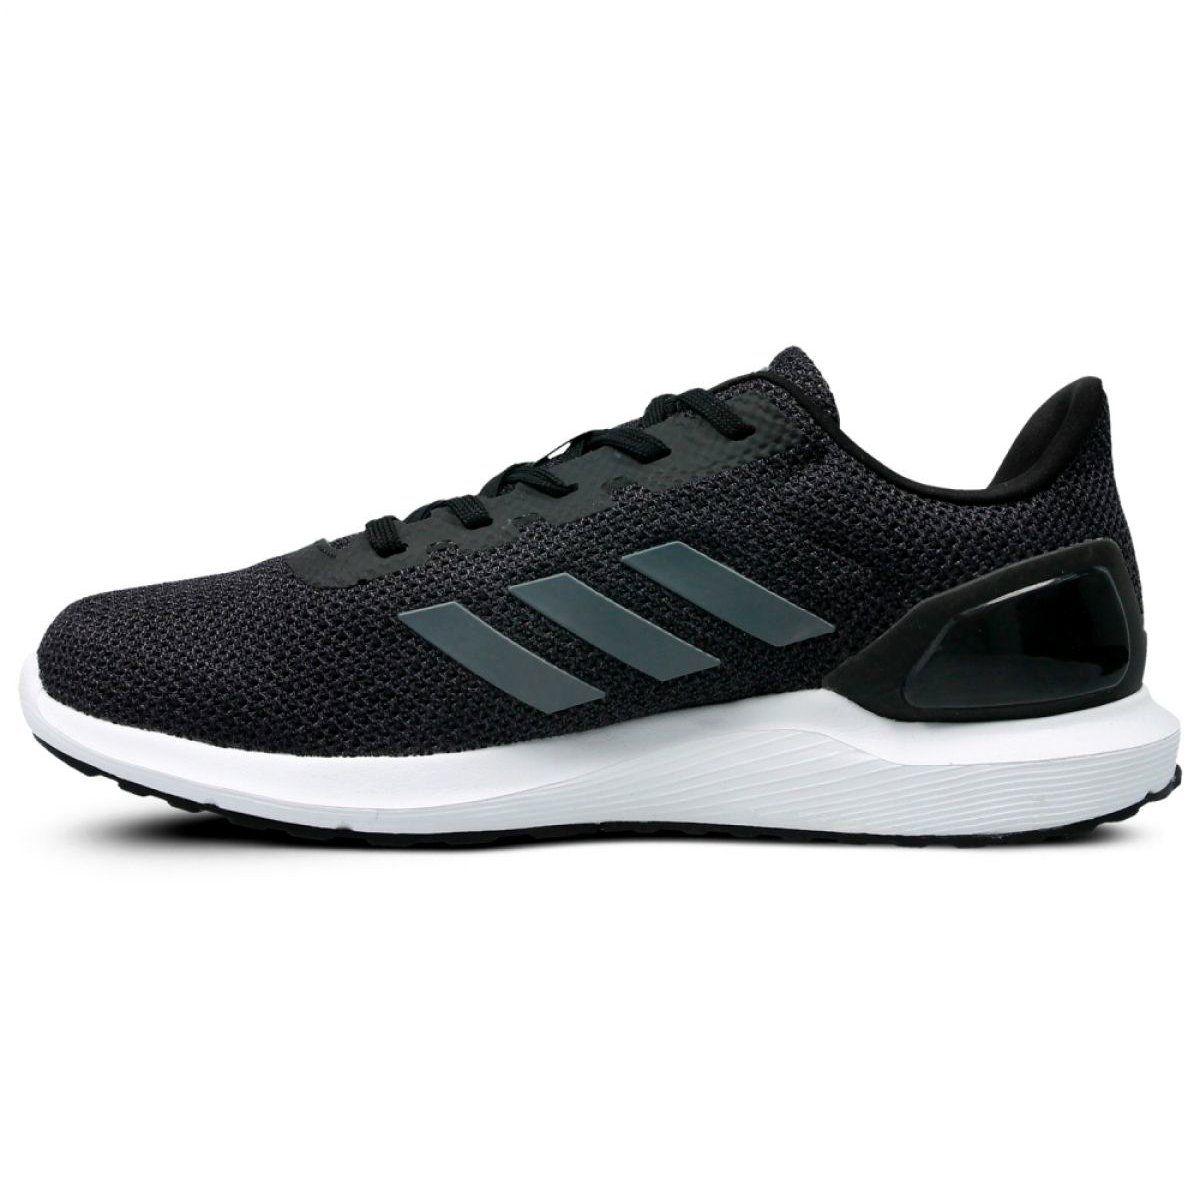 Treningowe Bieganie Sport Adidas Buty Biegowe Adidas Cosmic 2 M Db1758 Czarne Adidas Sneakers Shoes Sneakers